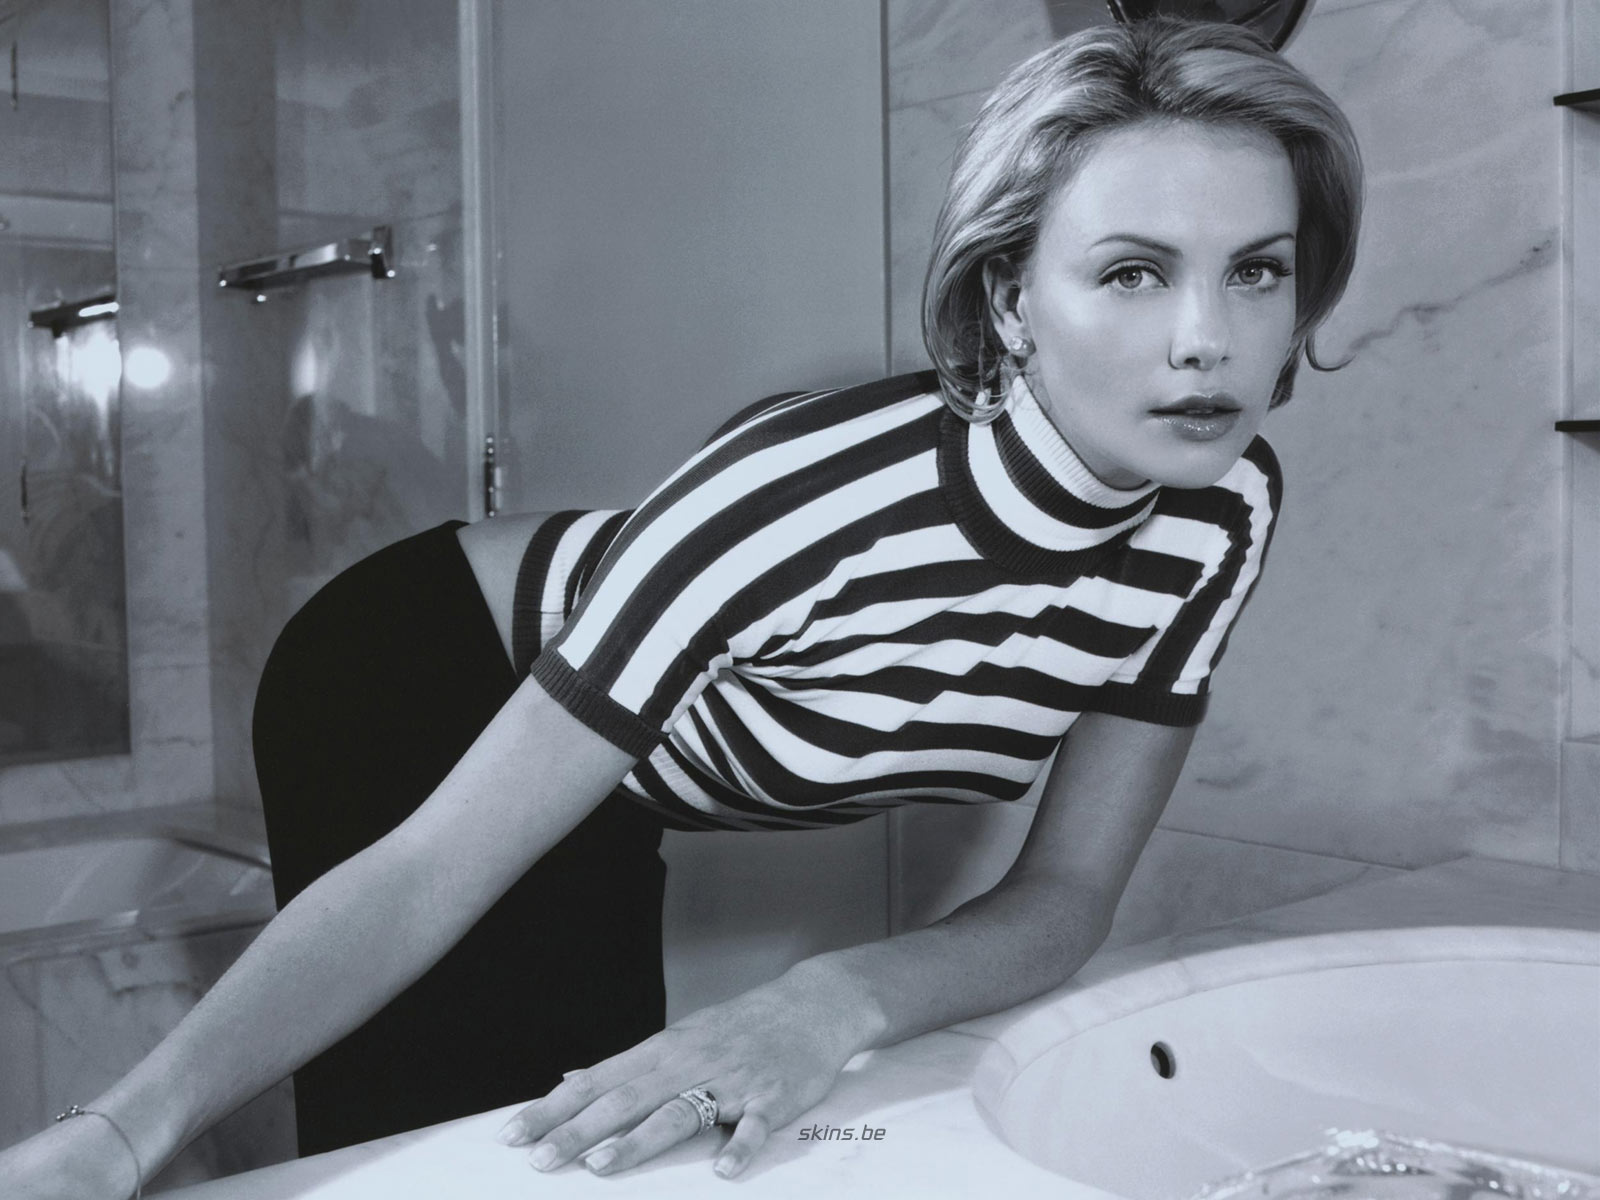 http://3.bp.blogspot.com/_GCAuqodmOE4/TS_Y9Gdm0UI/AAAAAAAAG-U/2md5aILbjCg/s1600/Charlize+Theron+In+Sexy+Strip+Shirt+Photos+%25282%2529.jpg